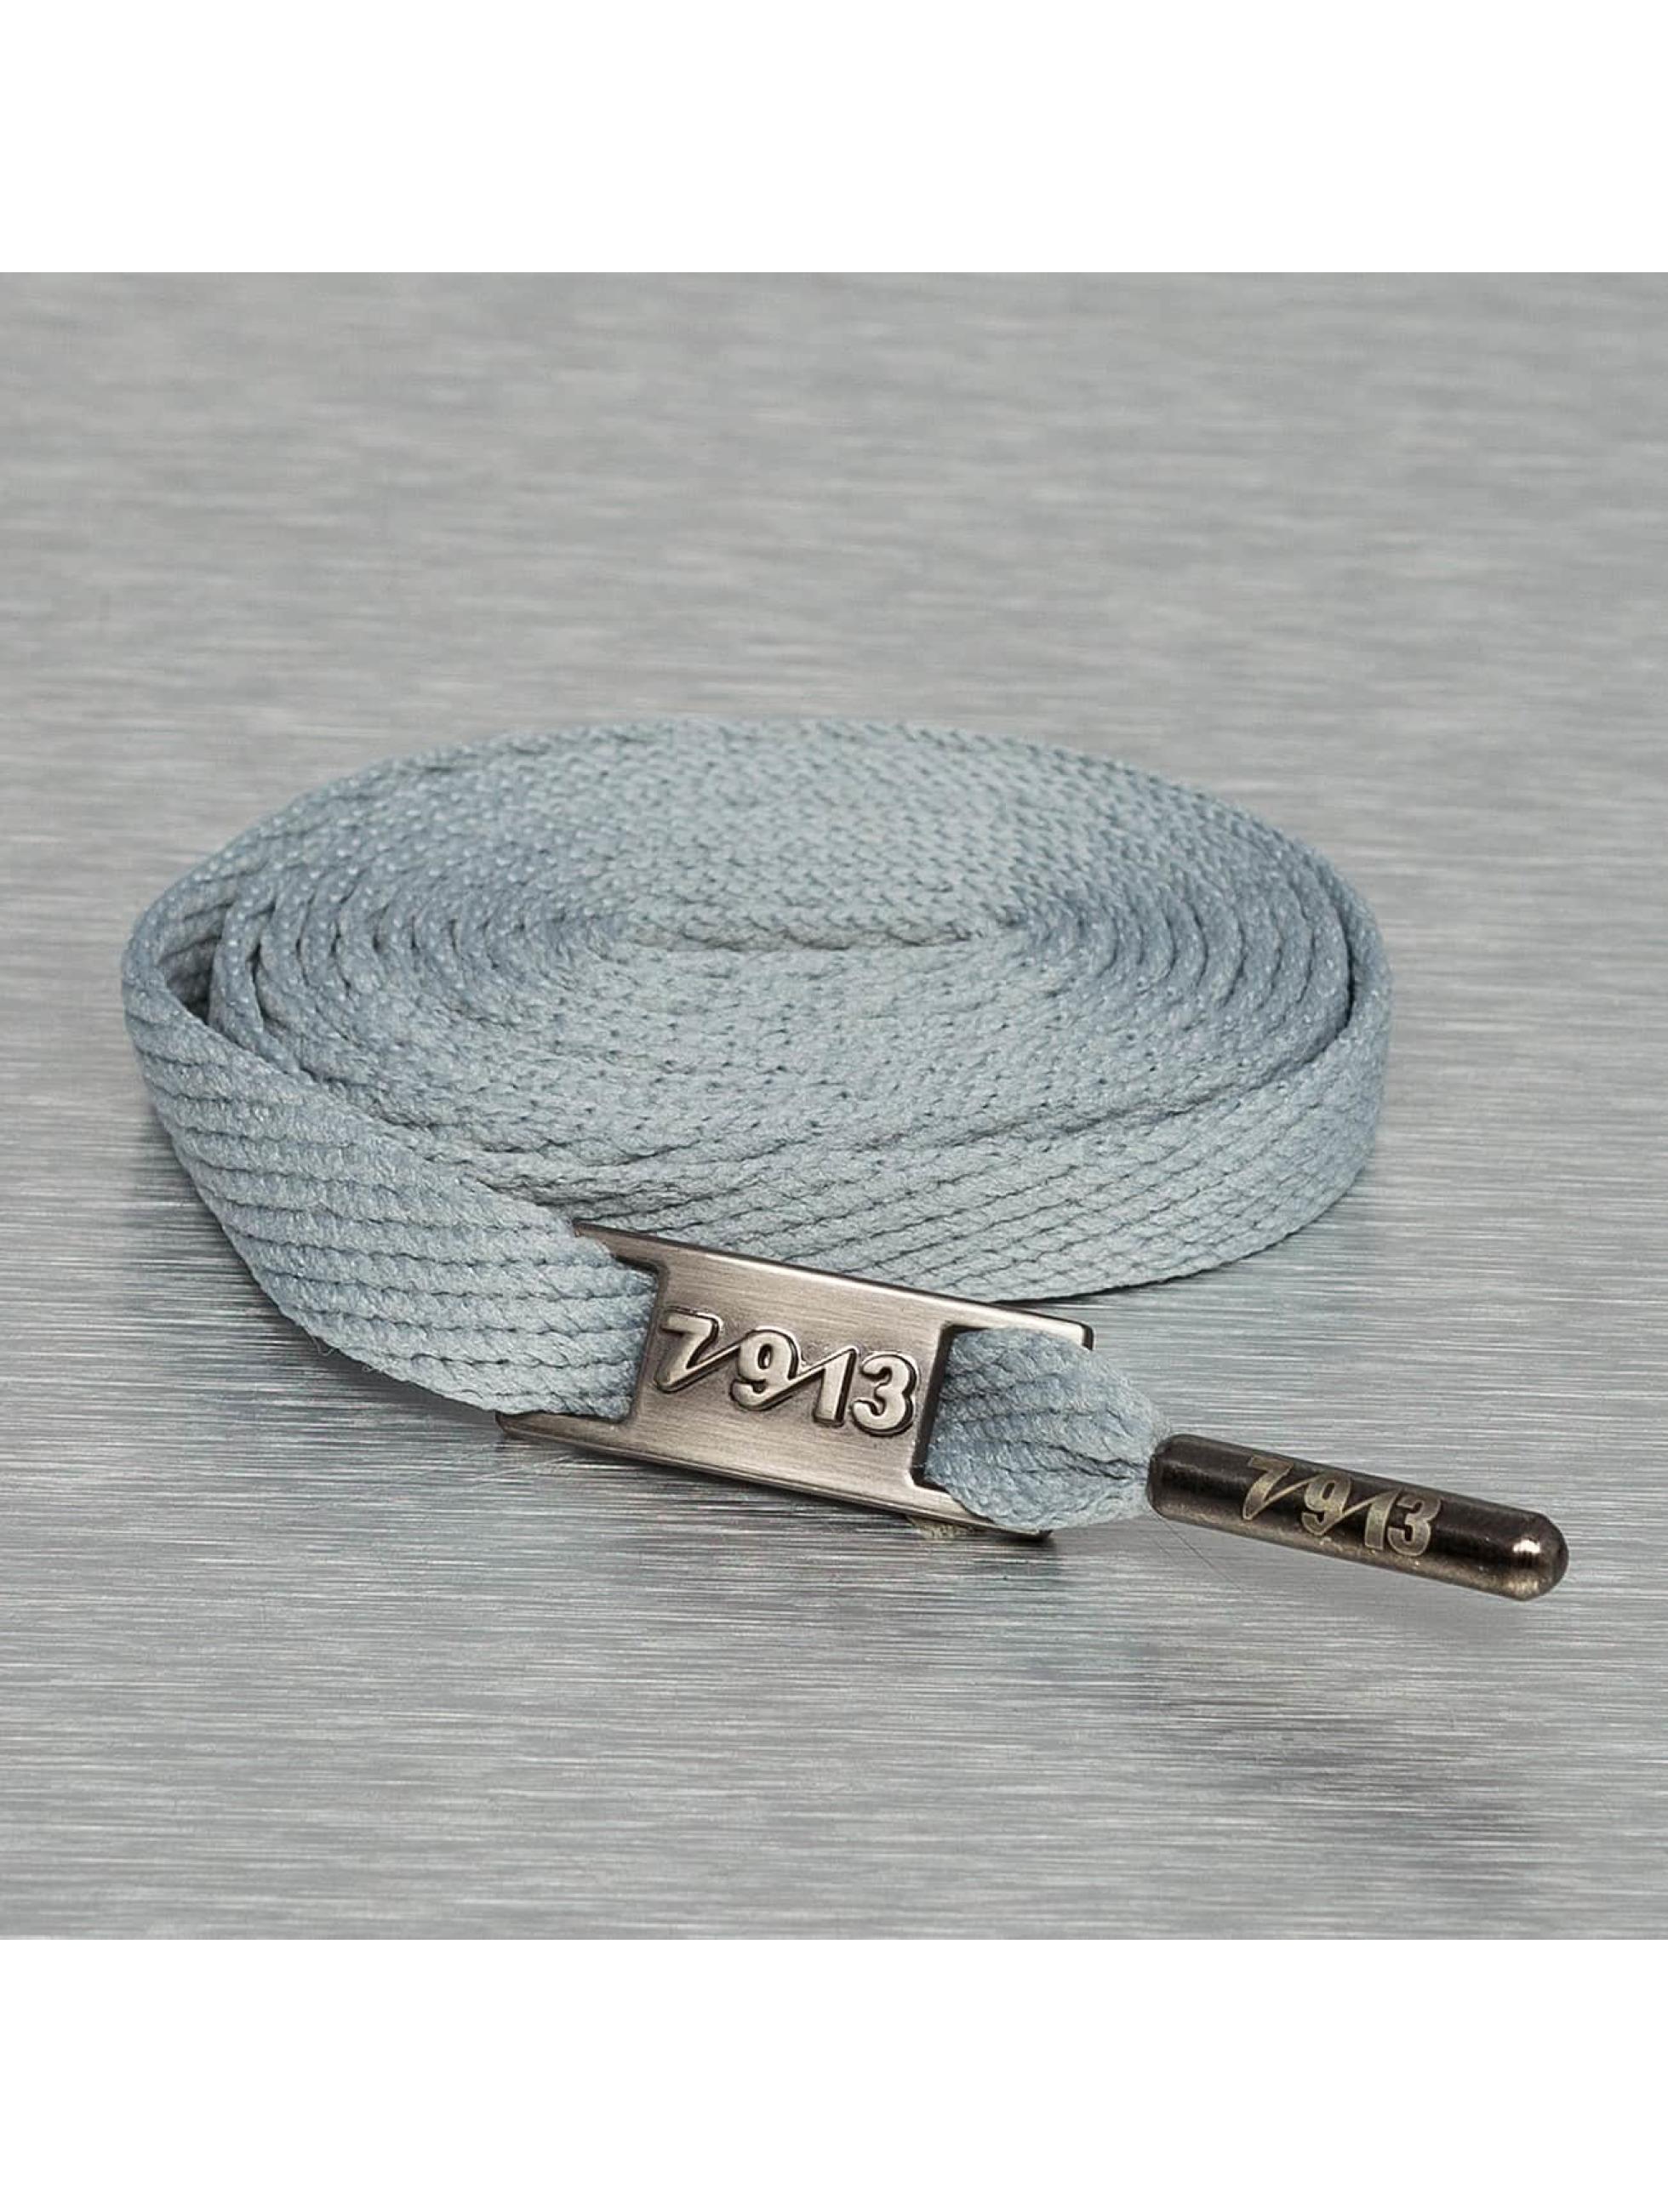 Seven Nine 13 Shoe accessorie Full Metal gray